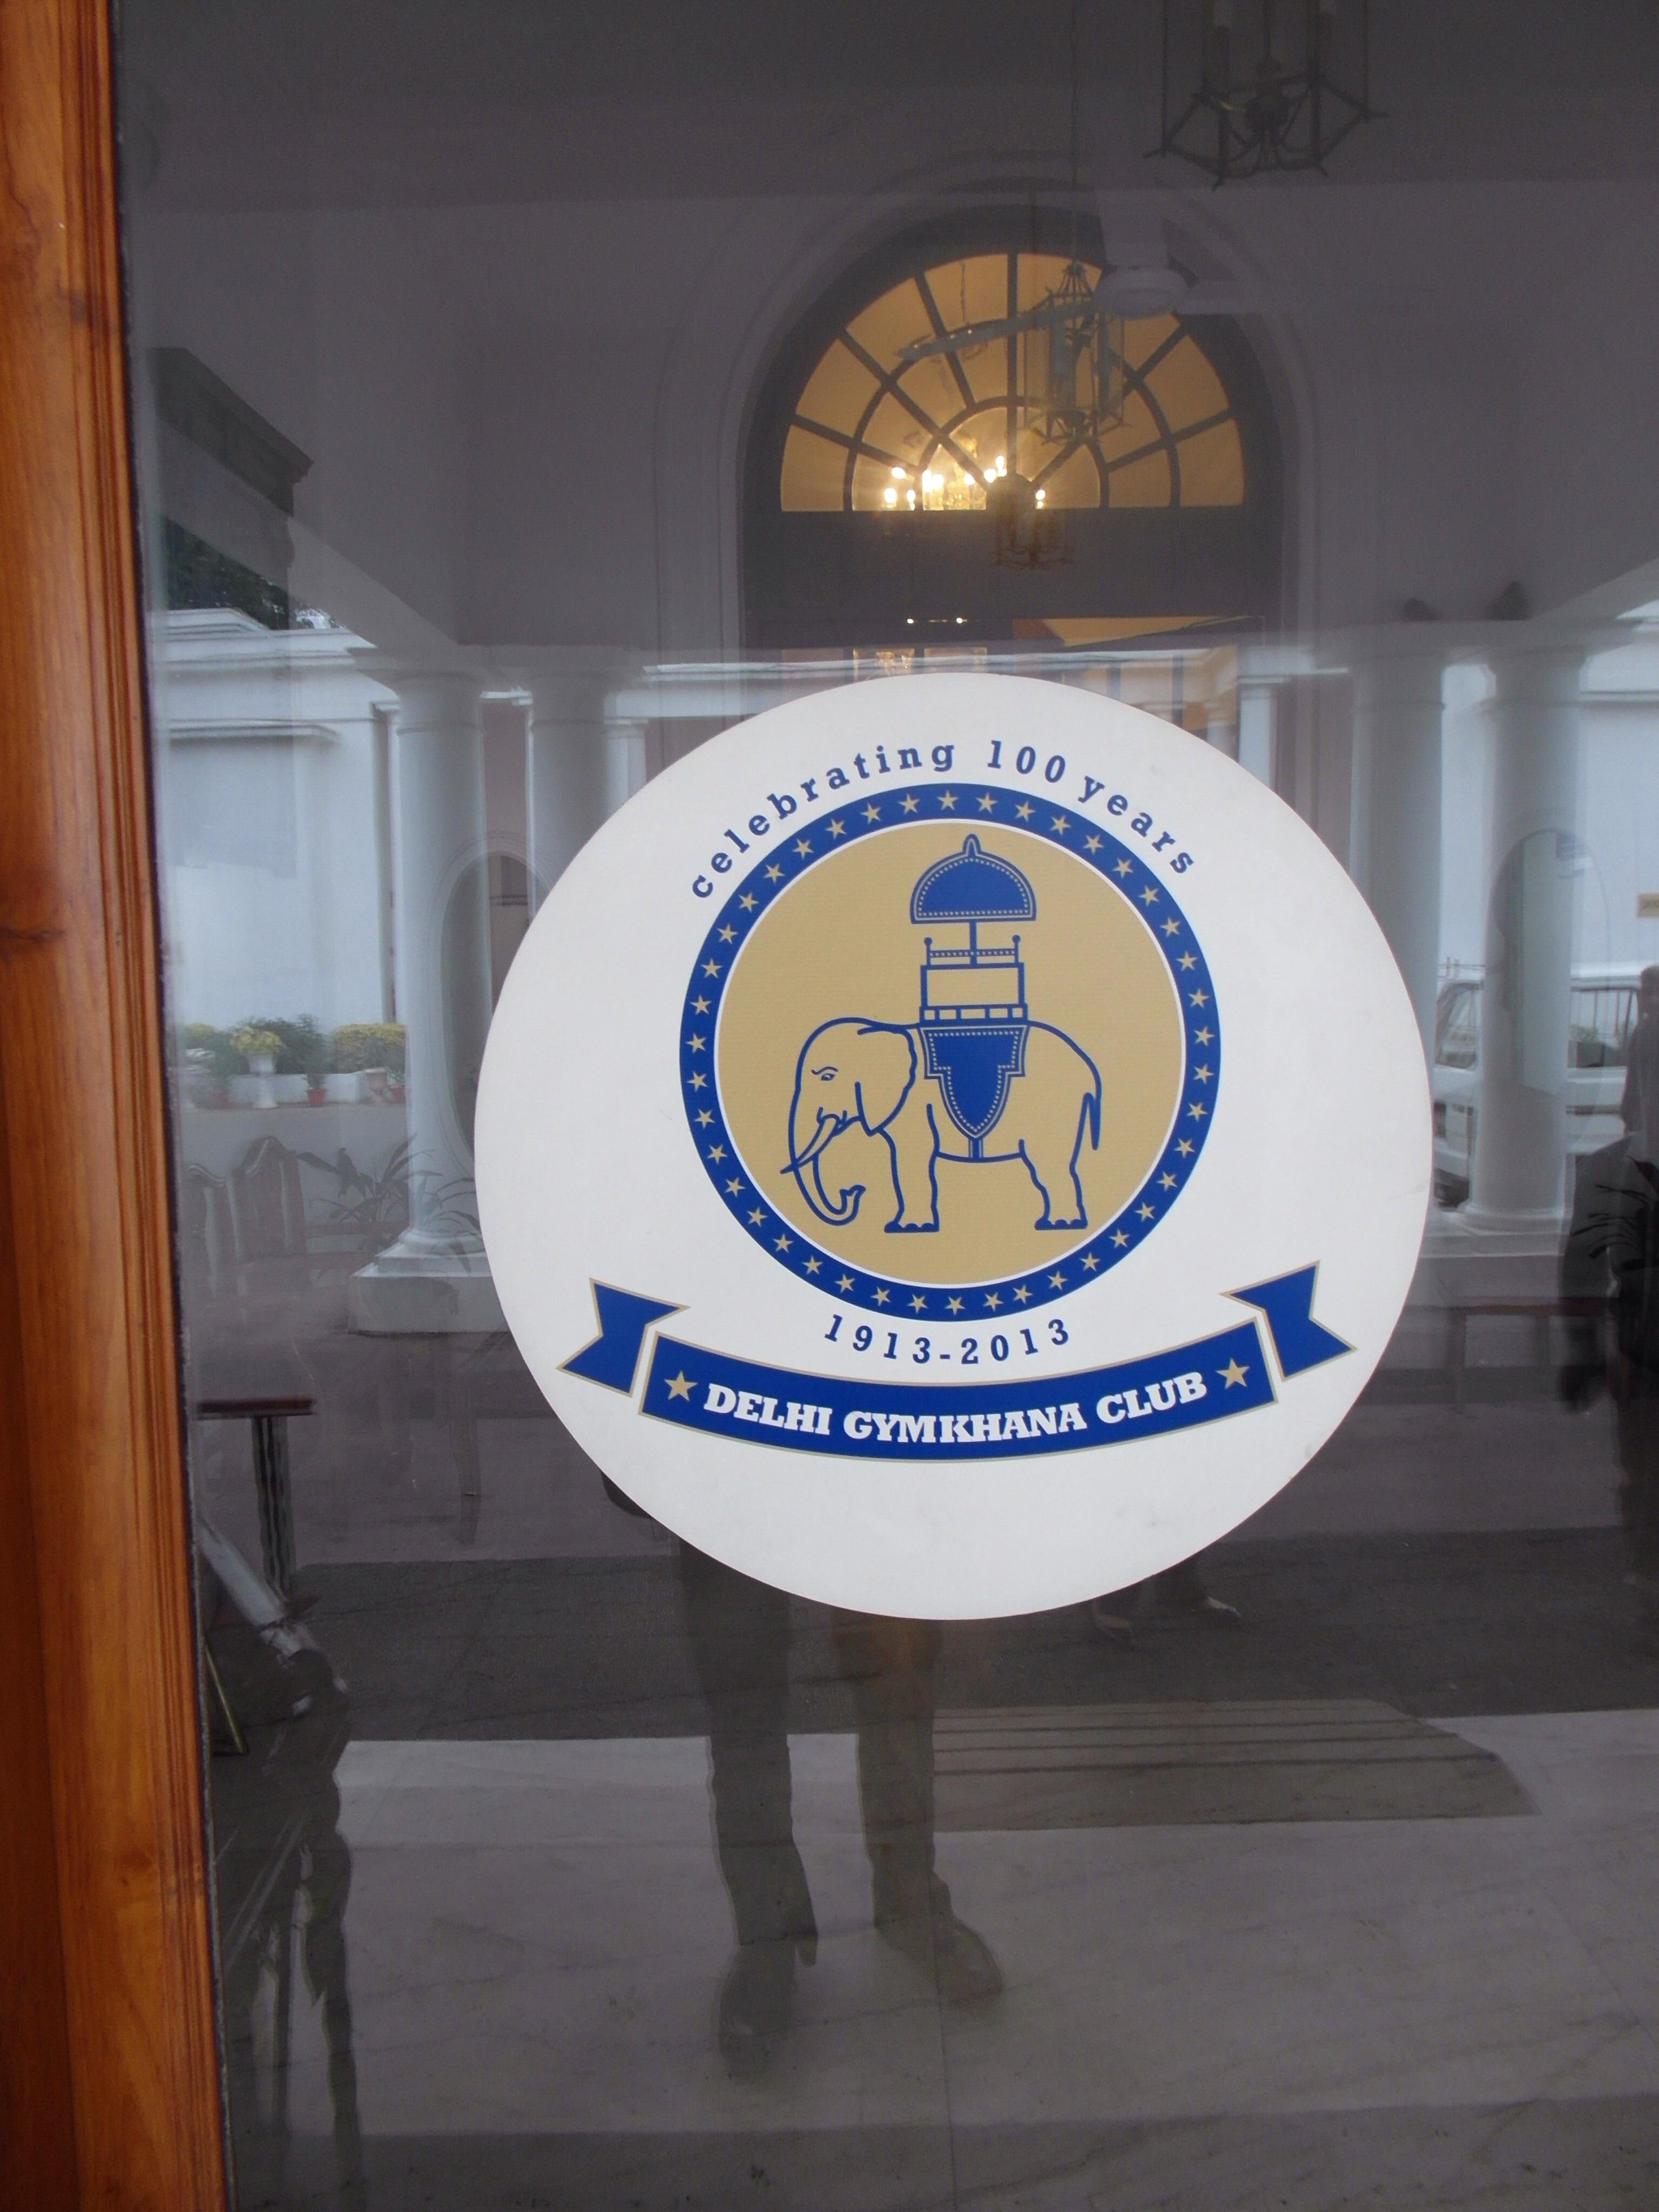 Delhi Gymkhana Club